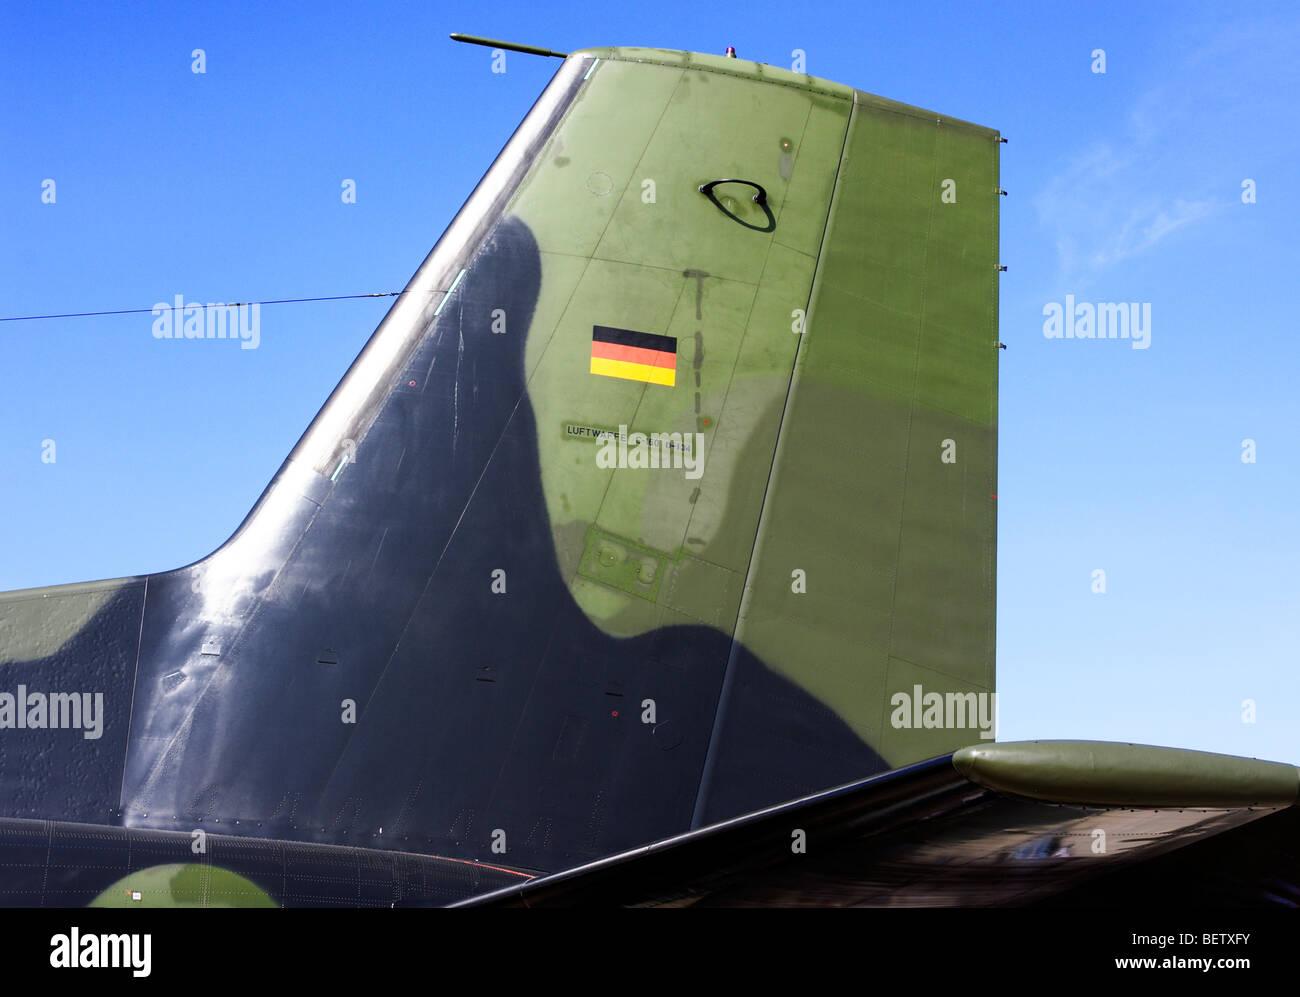 Rudder of Transall C-160 - Stock Image